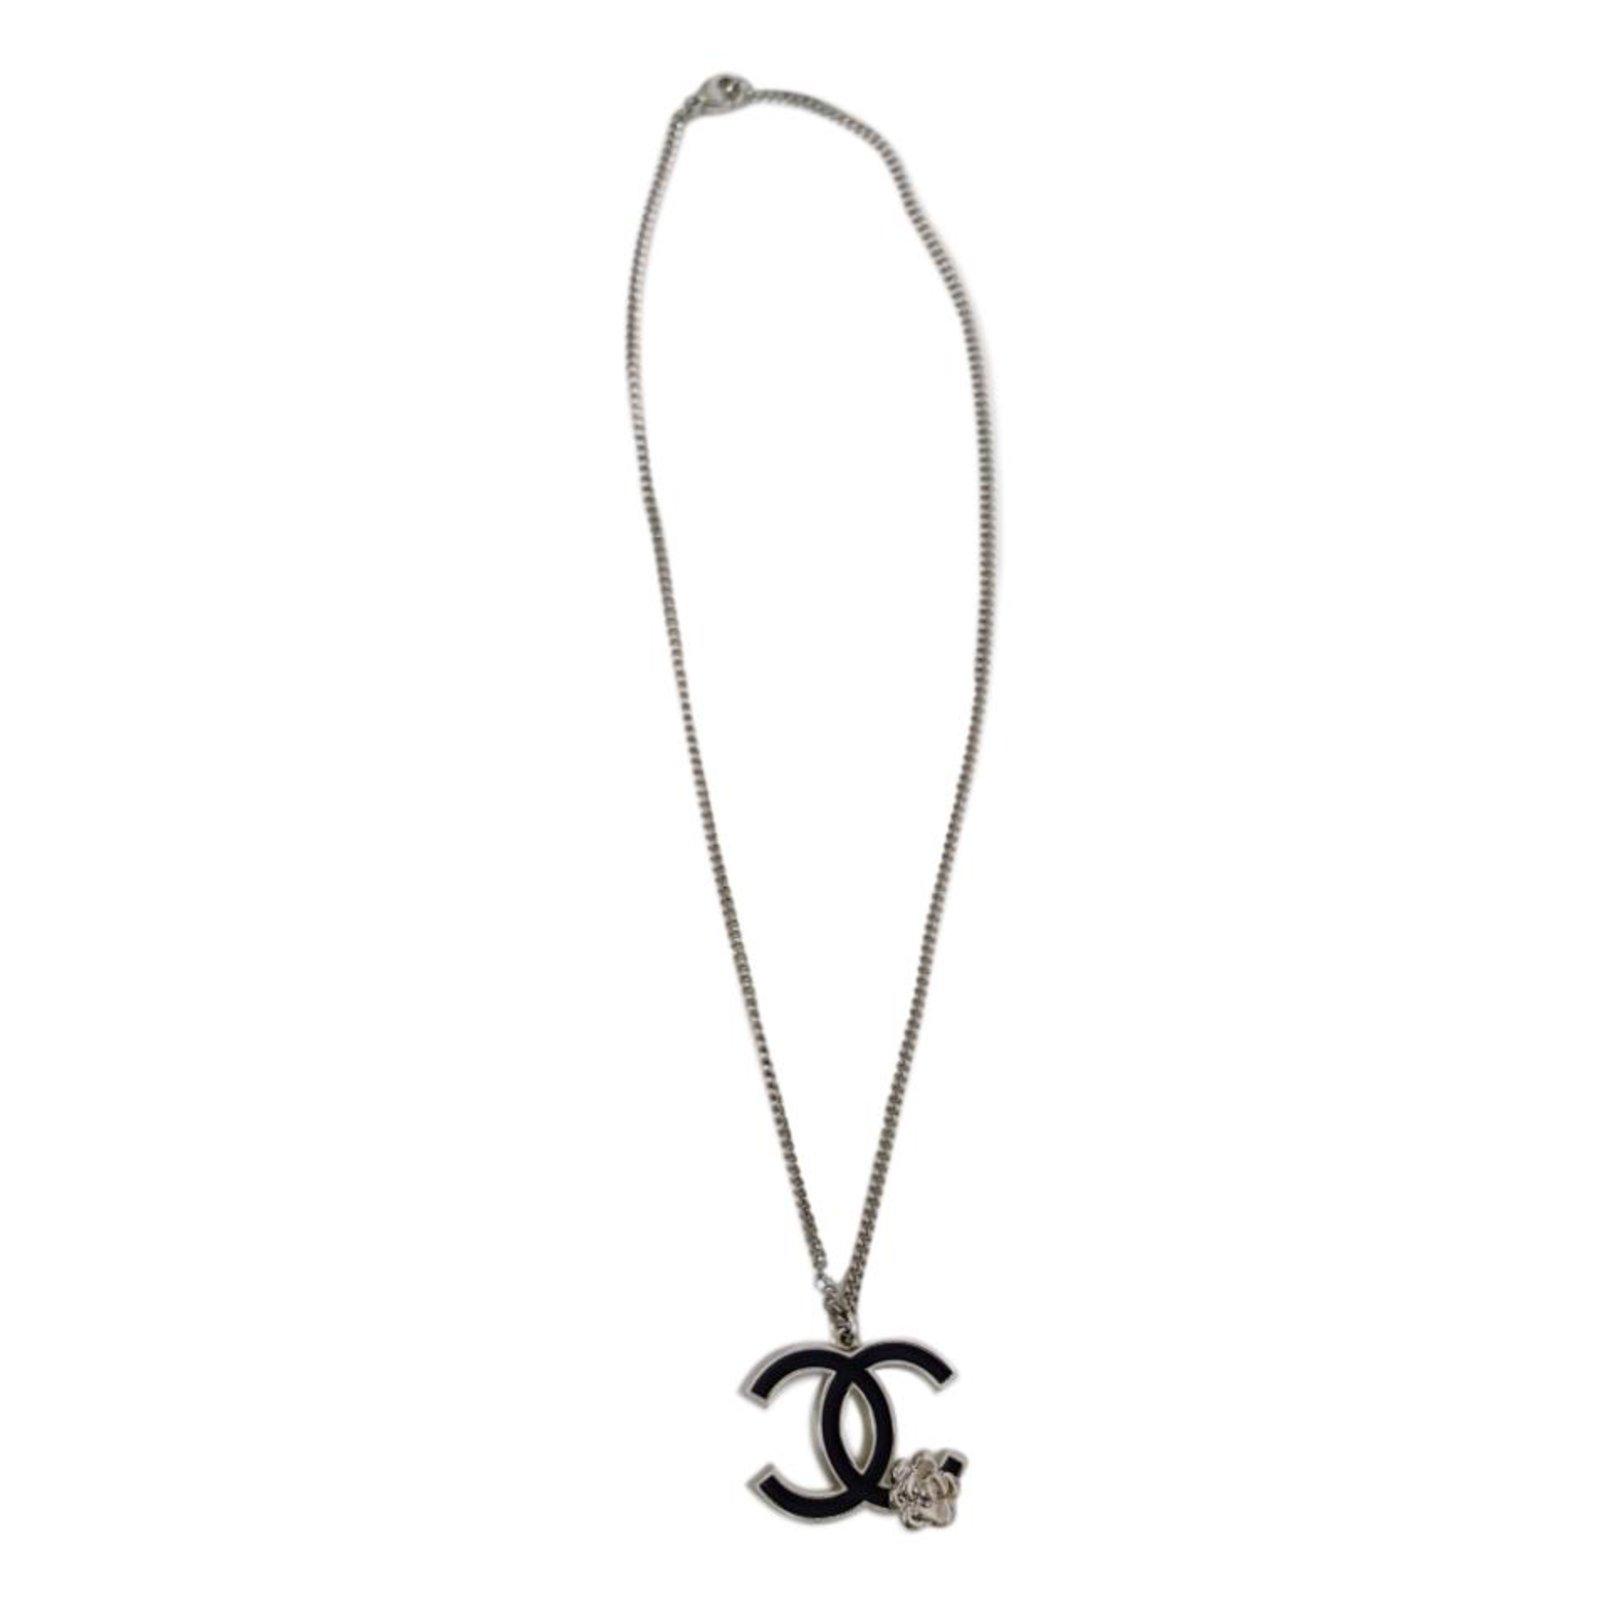 16b2256230cd50 Chanel Camelia Long necklaces Steel Black,Silvery ref.90428 - Joli ...